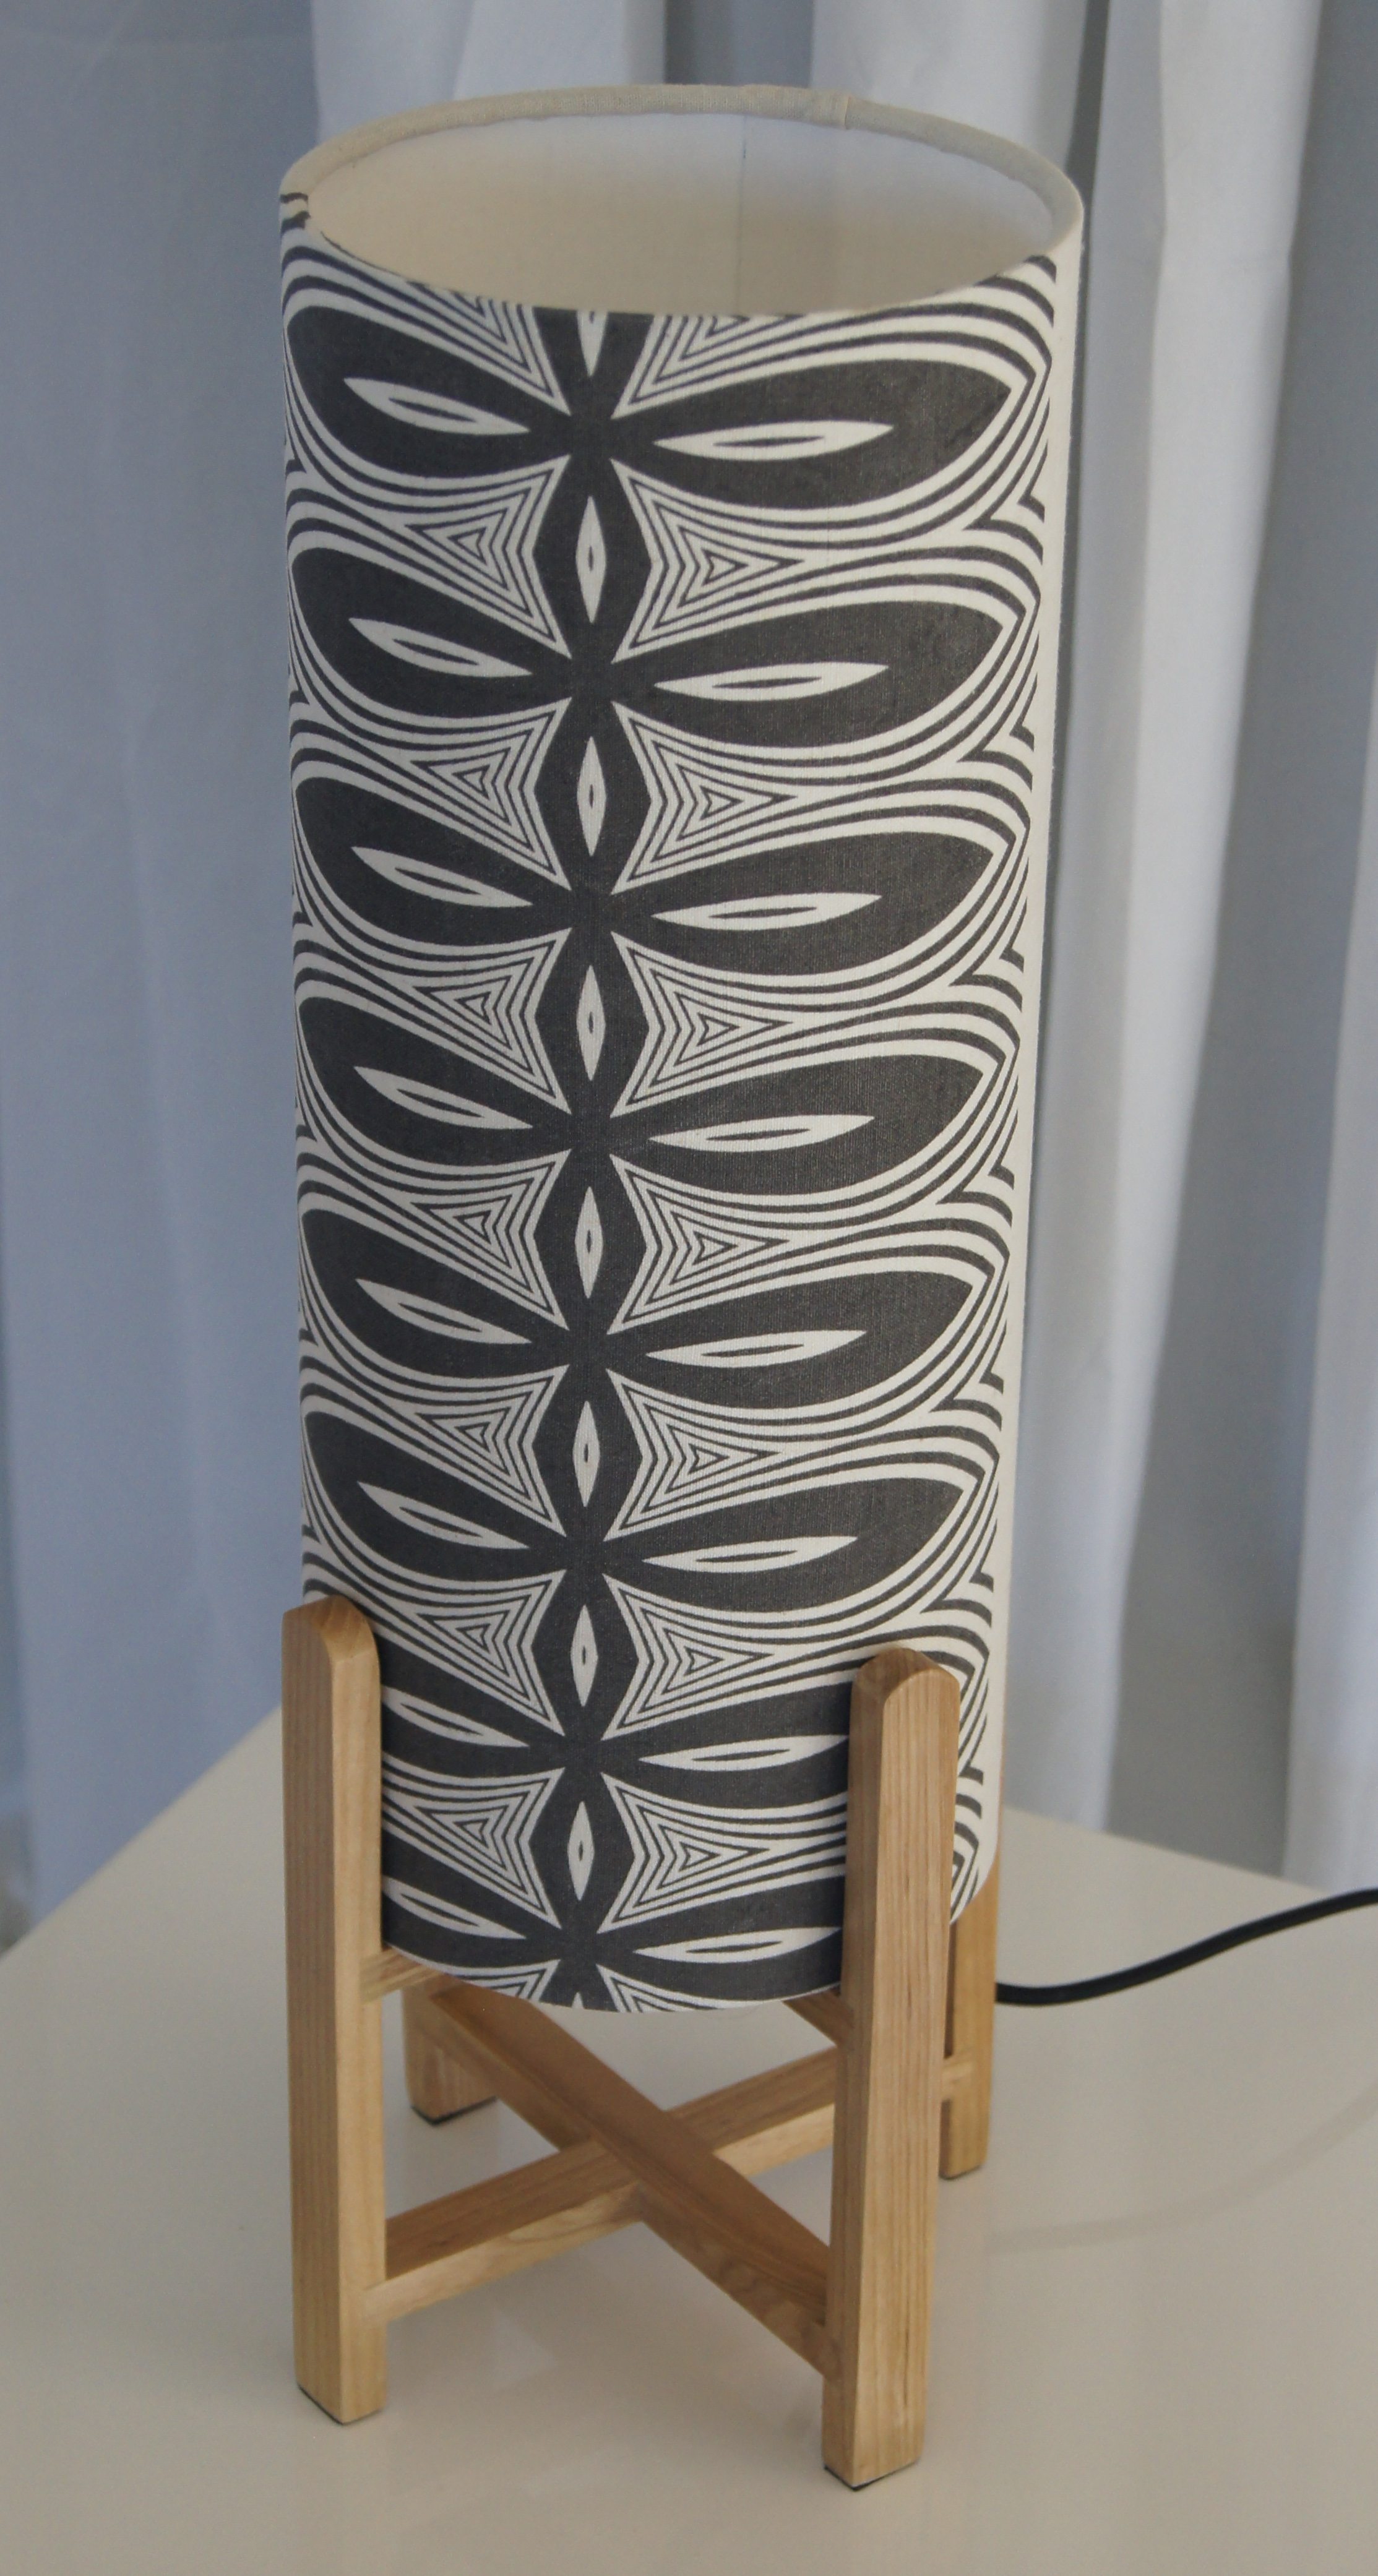 Pasifika Design